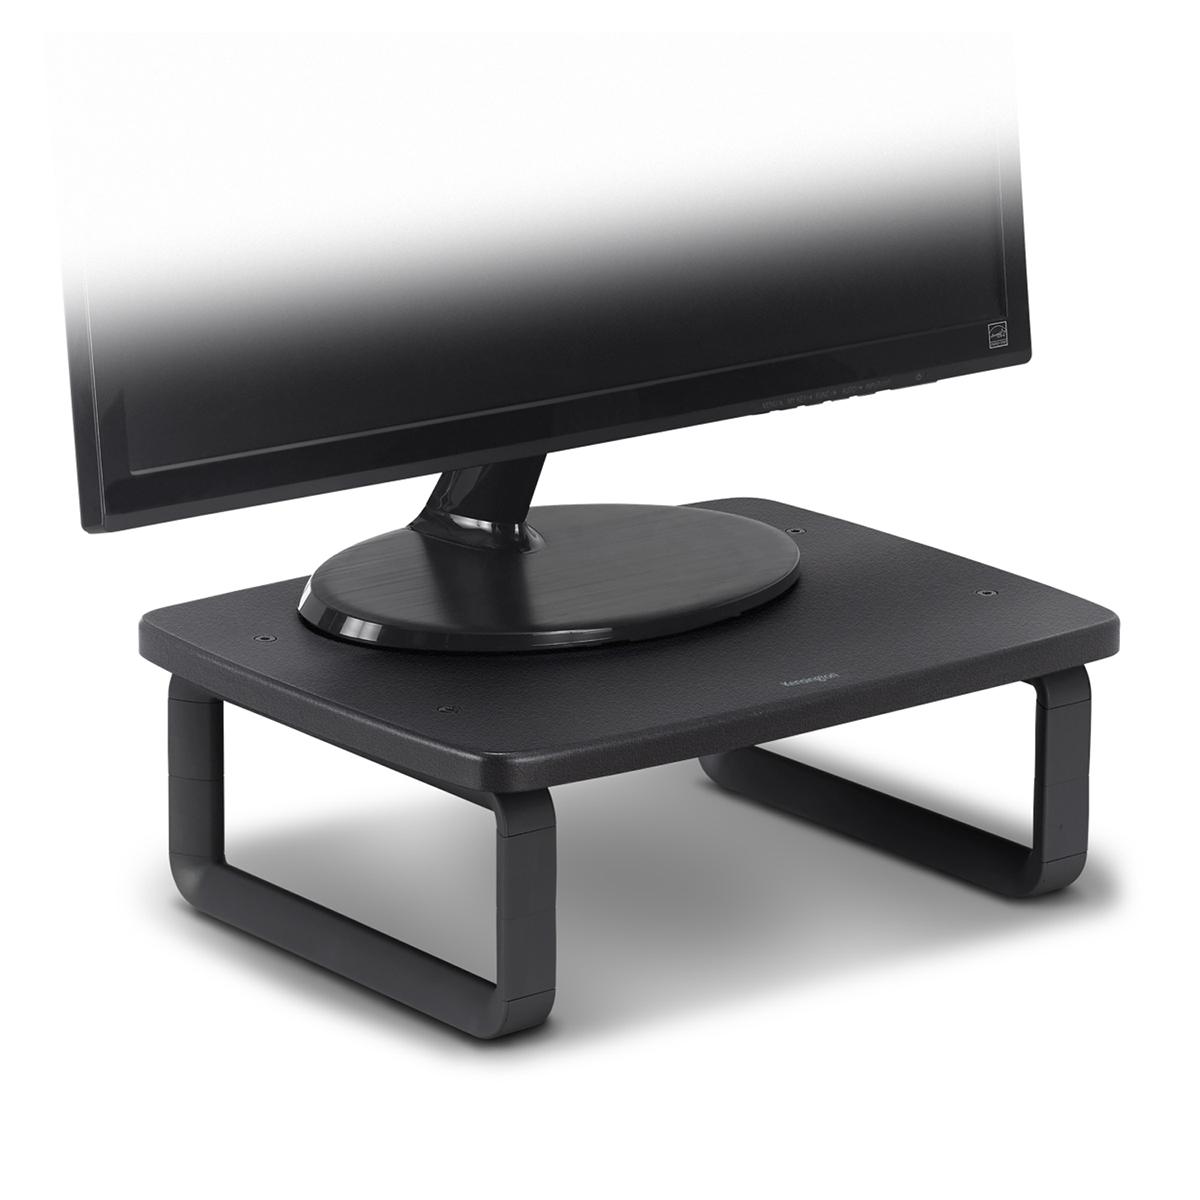 Kensington K52786WW Monitor Stand Plus with SmartFit System - Black